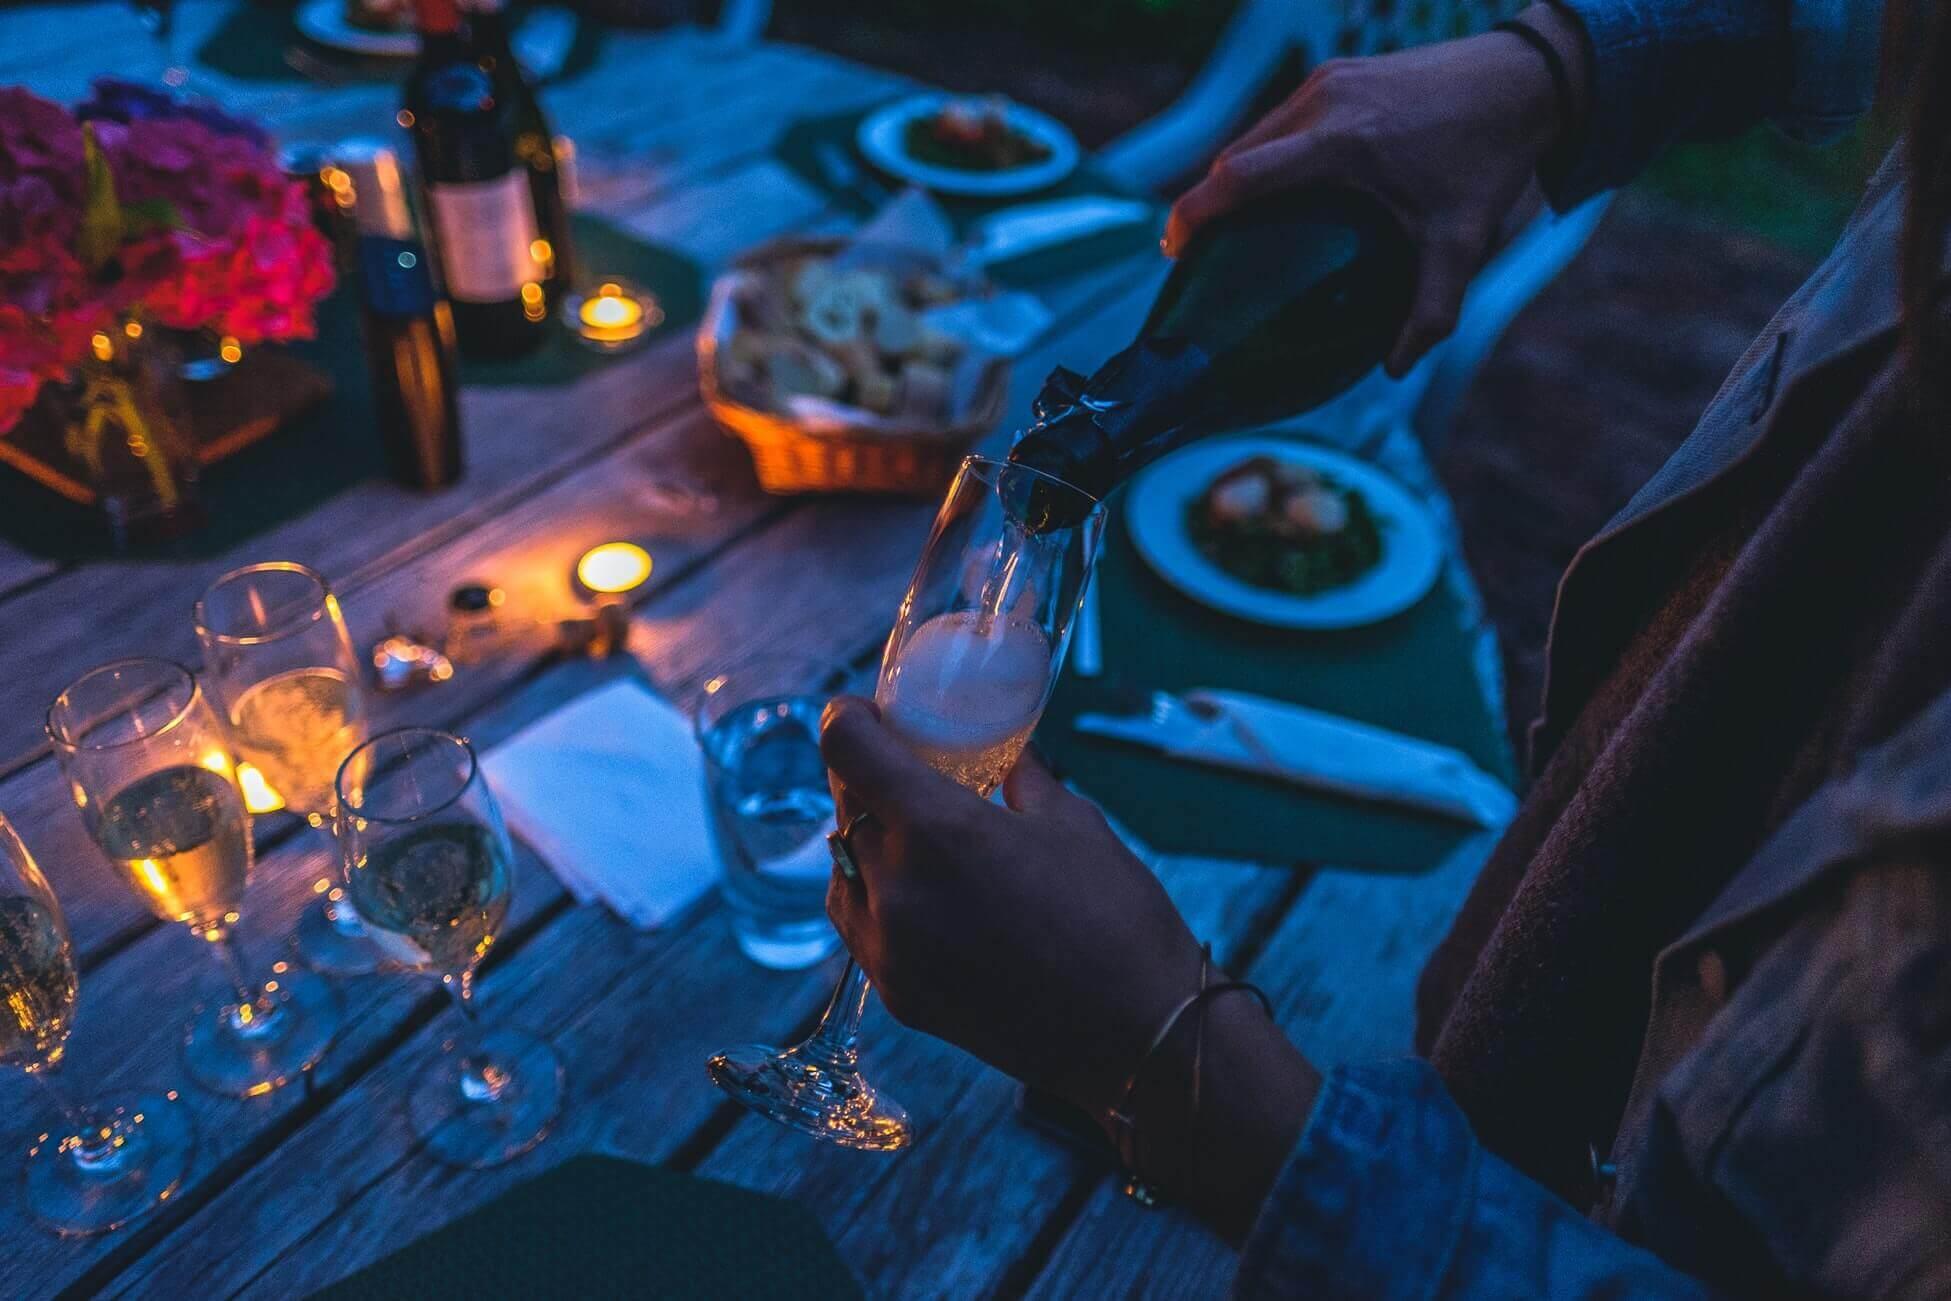 Поясним за новости: пенсионерка из Канады осталась дома без вина